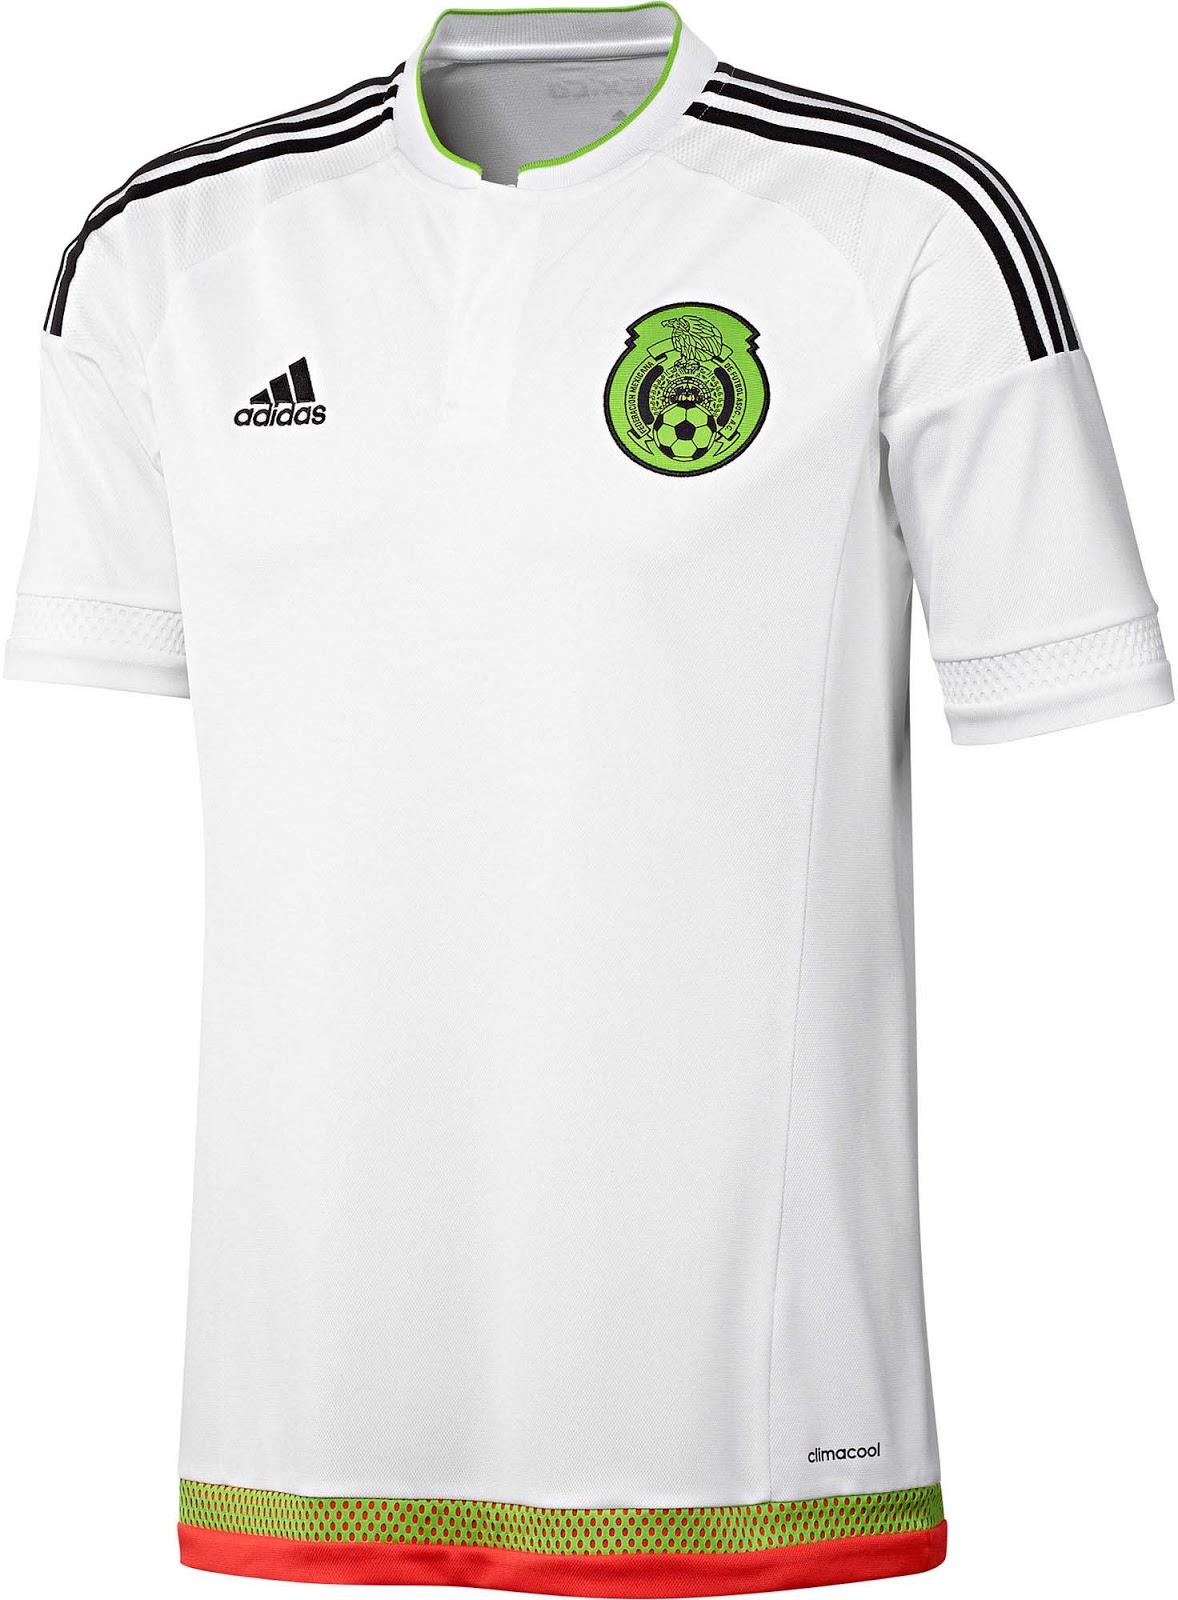 mexico 2015 copa america kits released   footy headlines